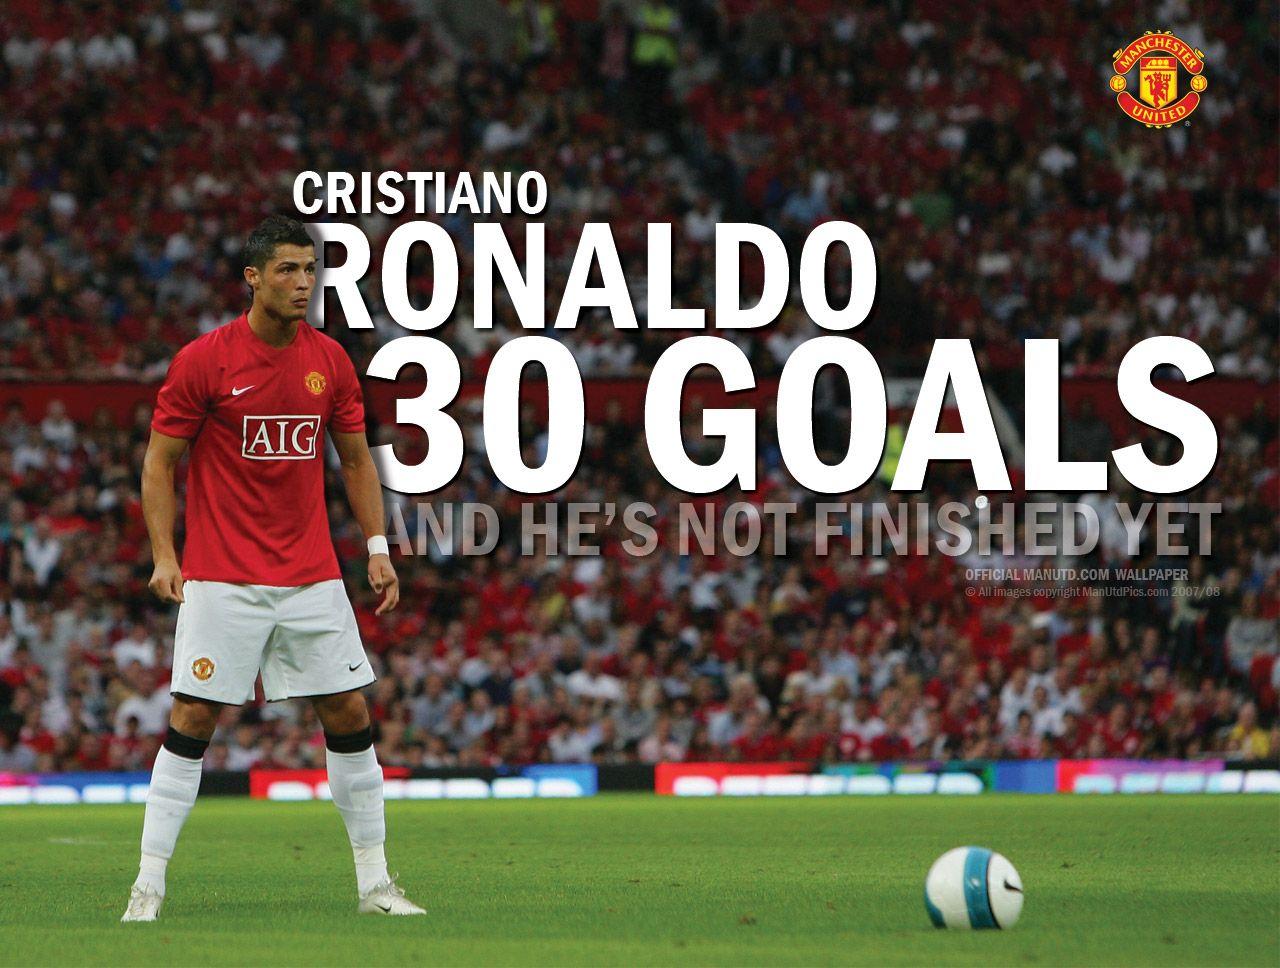 http://3.bp.blogspot.com/-zuWEw8qPHlk/Tq_9tpB0l9I/AAAAAAAACR8/6WpCY754Sfo/s1600/Cristiano-Ronaldo-Wallpapers-25.jpg